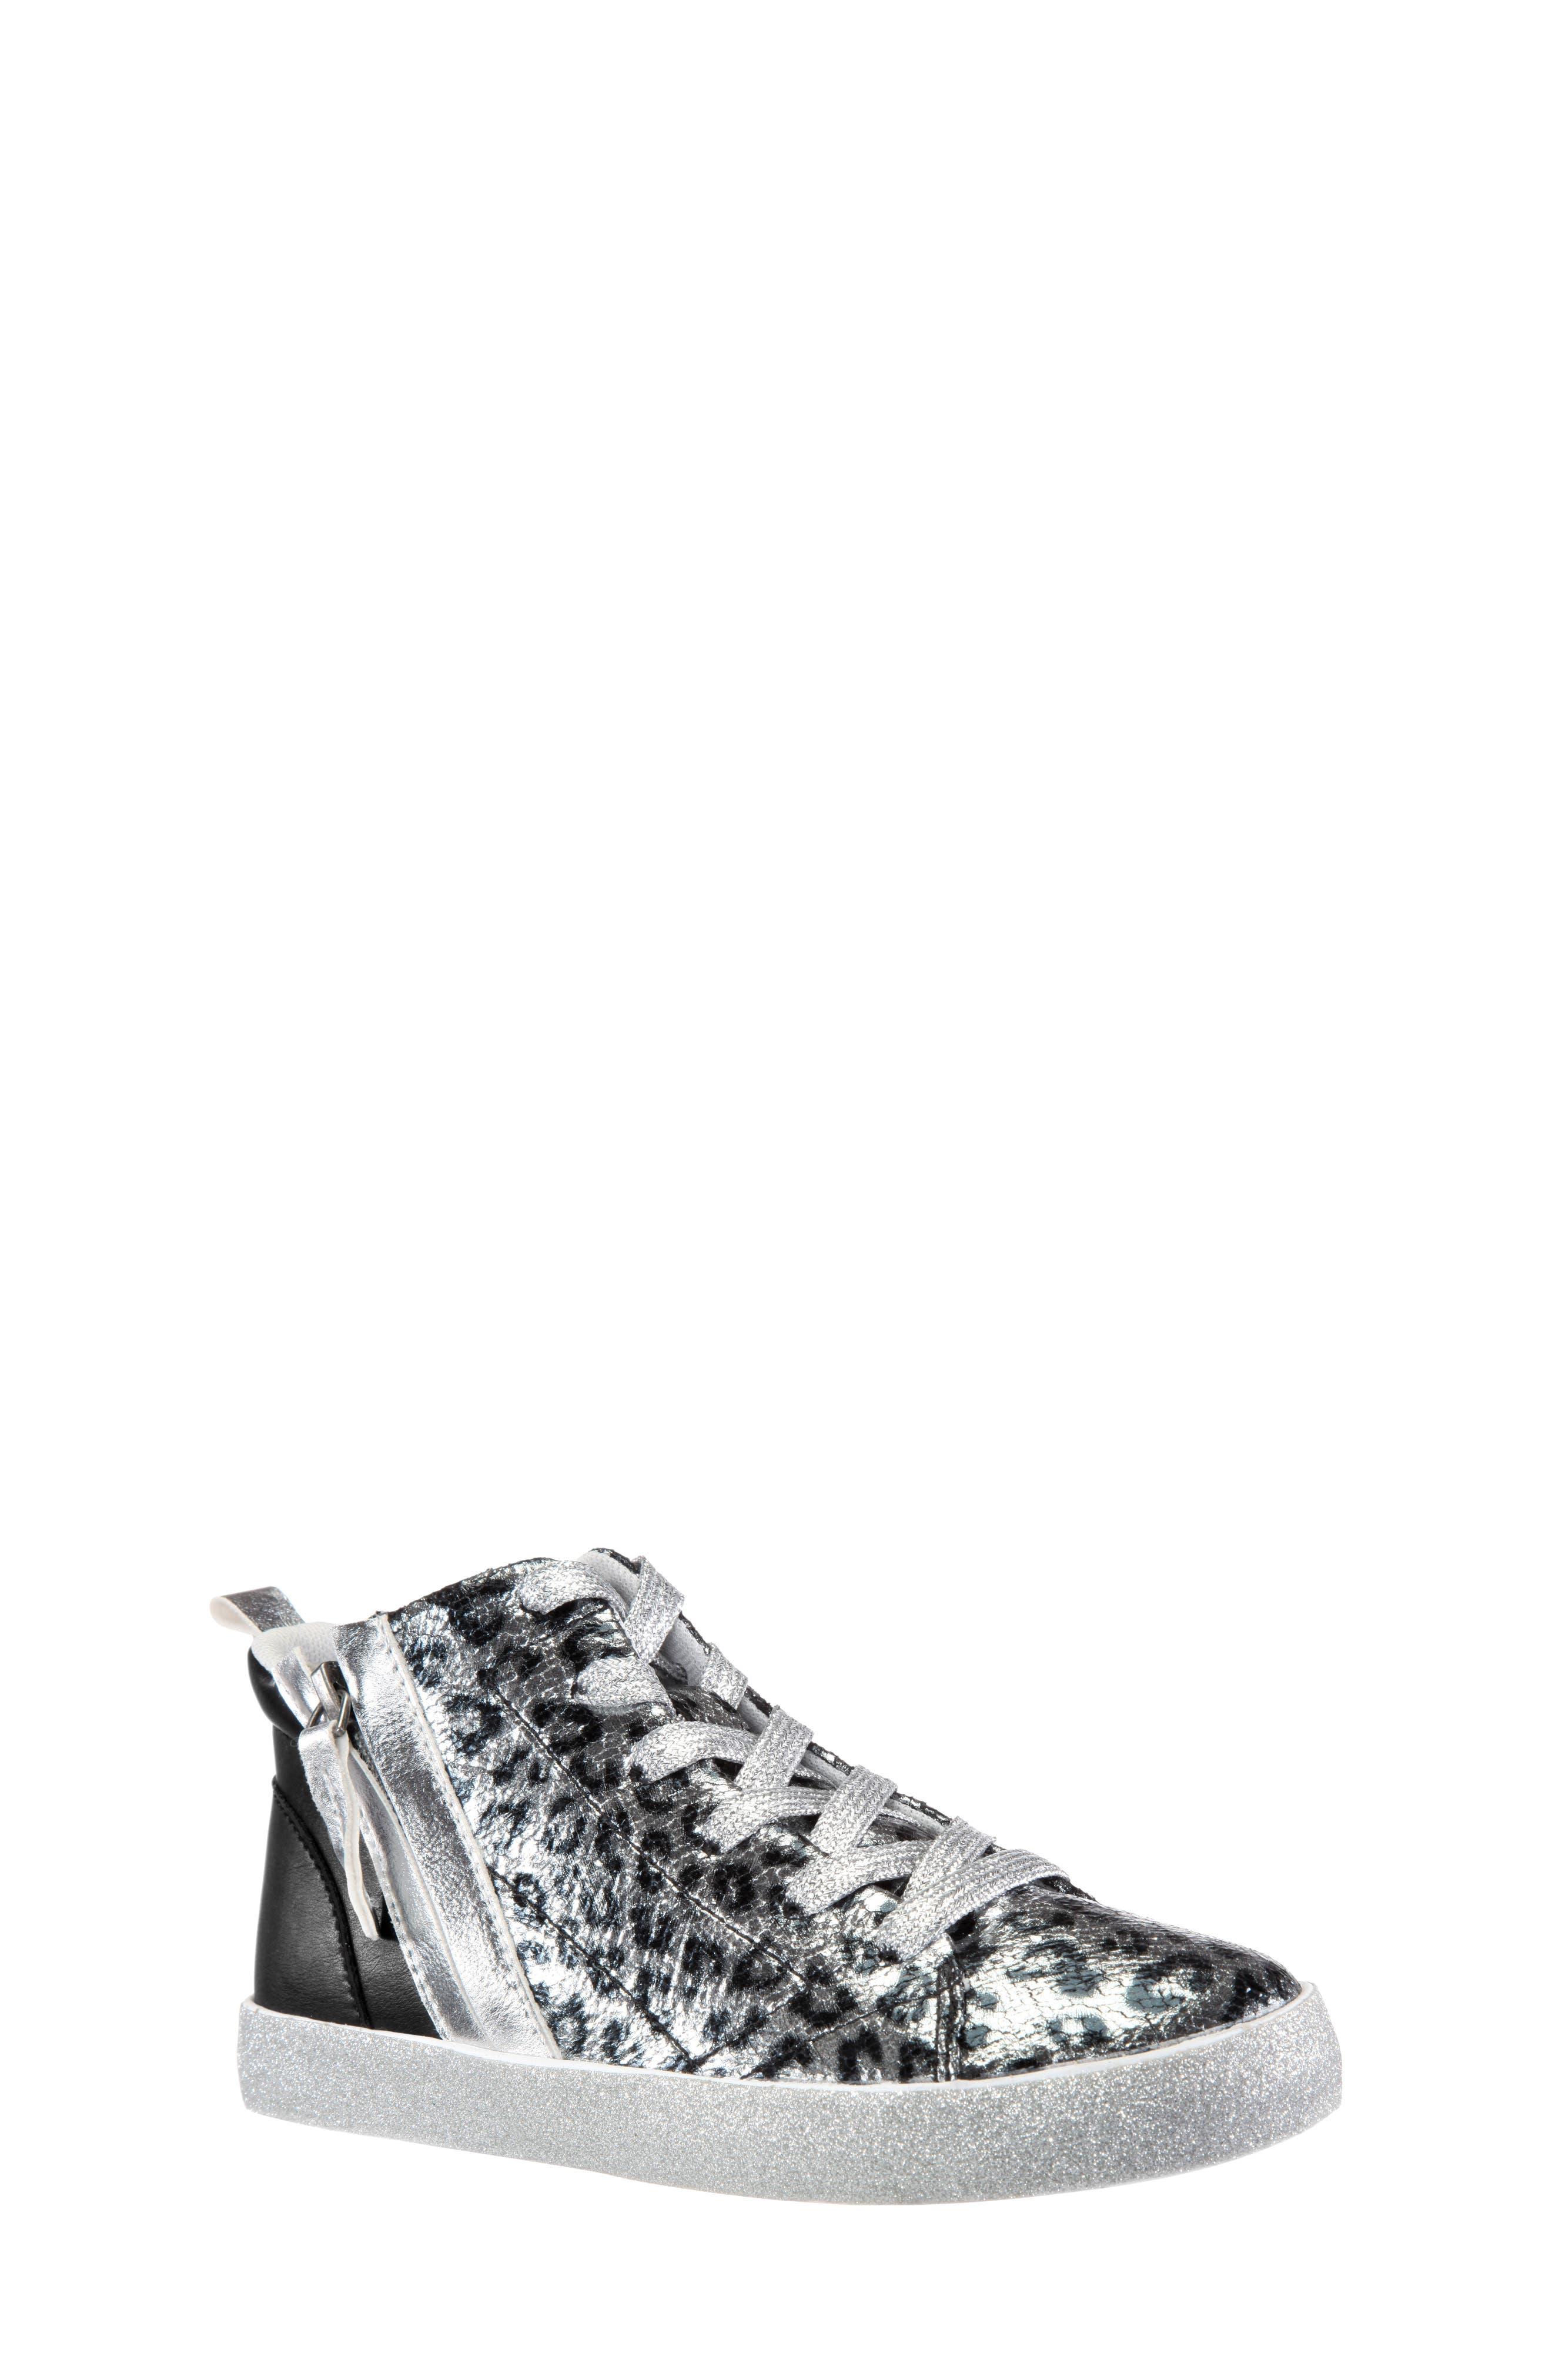 Toddler Girls Nina Jossie2 Metallic Leopard Print High Top Sneaker Size 12 M  Metallic